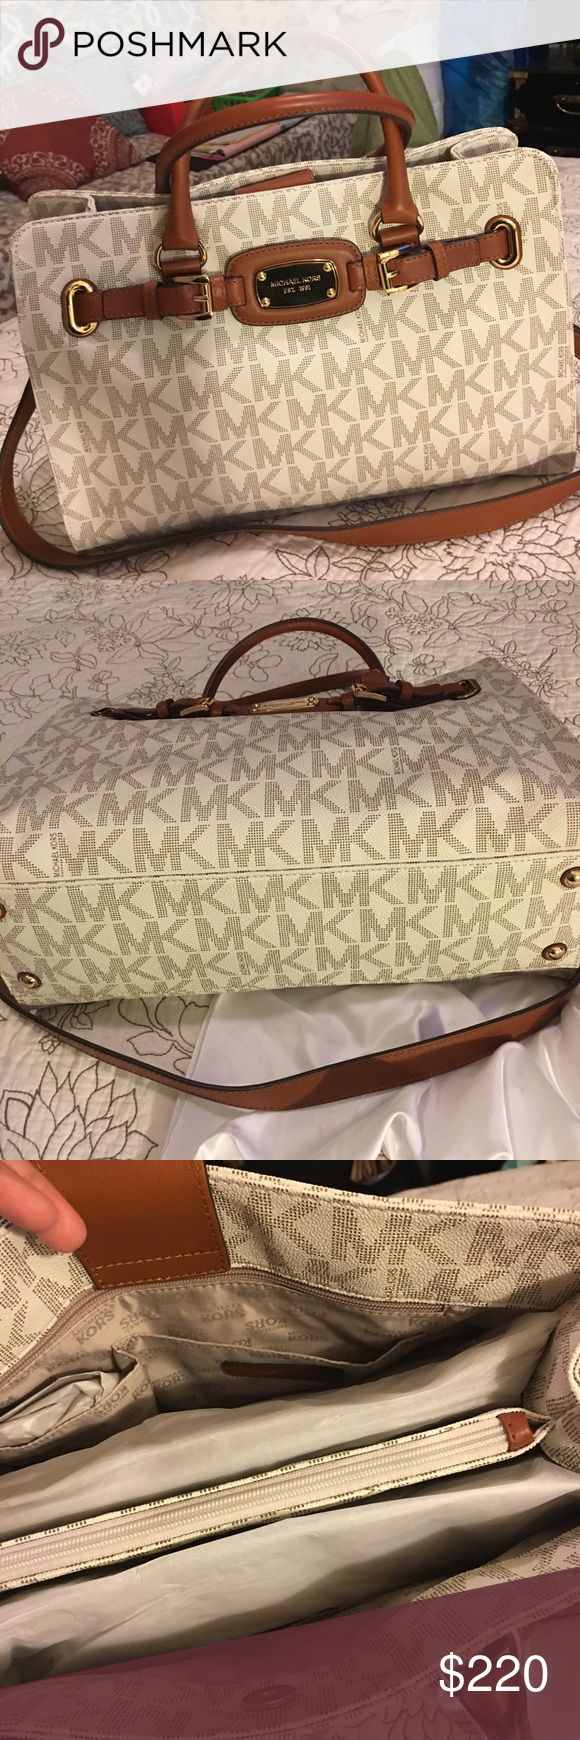 MK hand bag brand new MK bag with tag KORS Michael Kors Bags Satchels